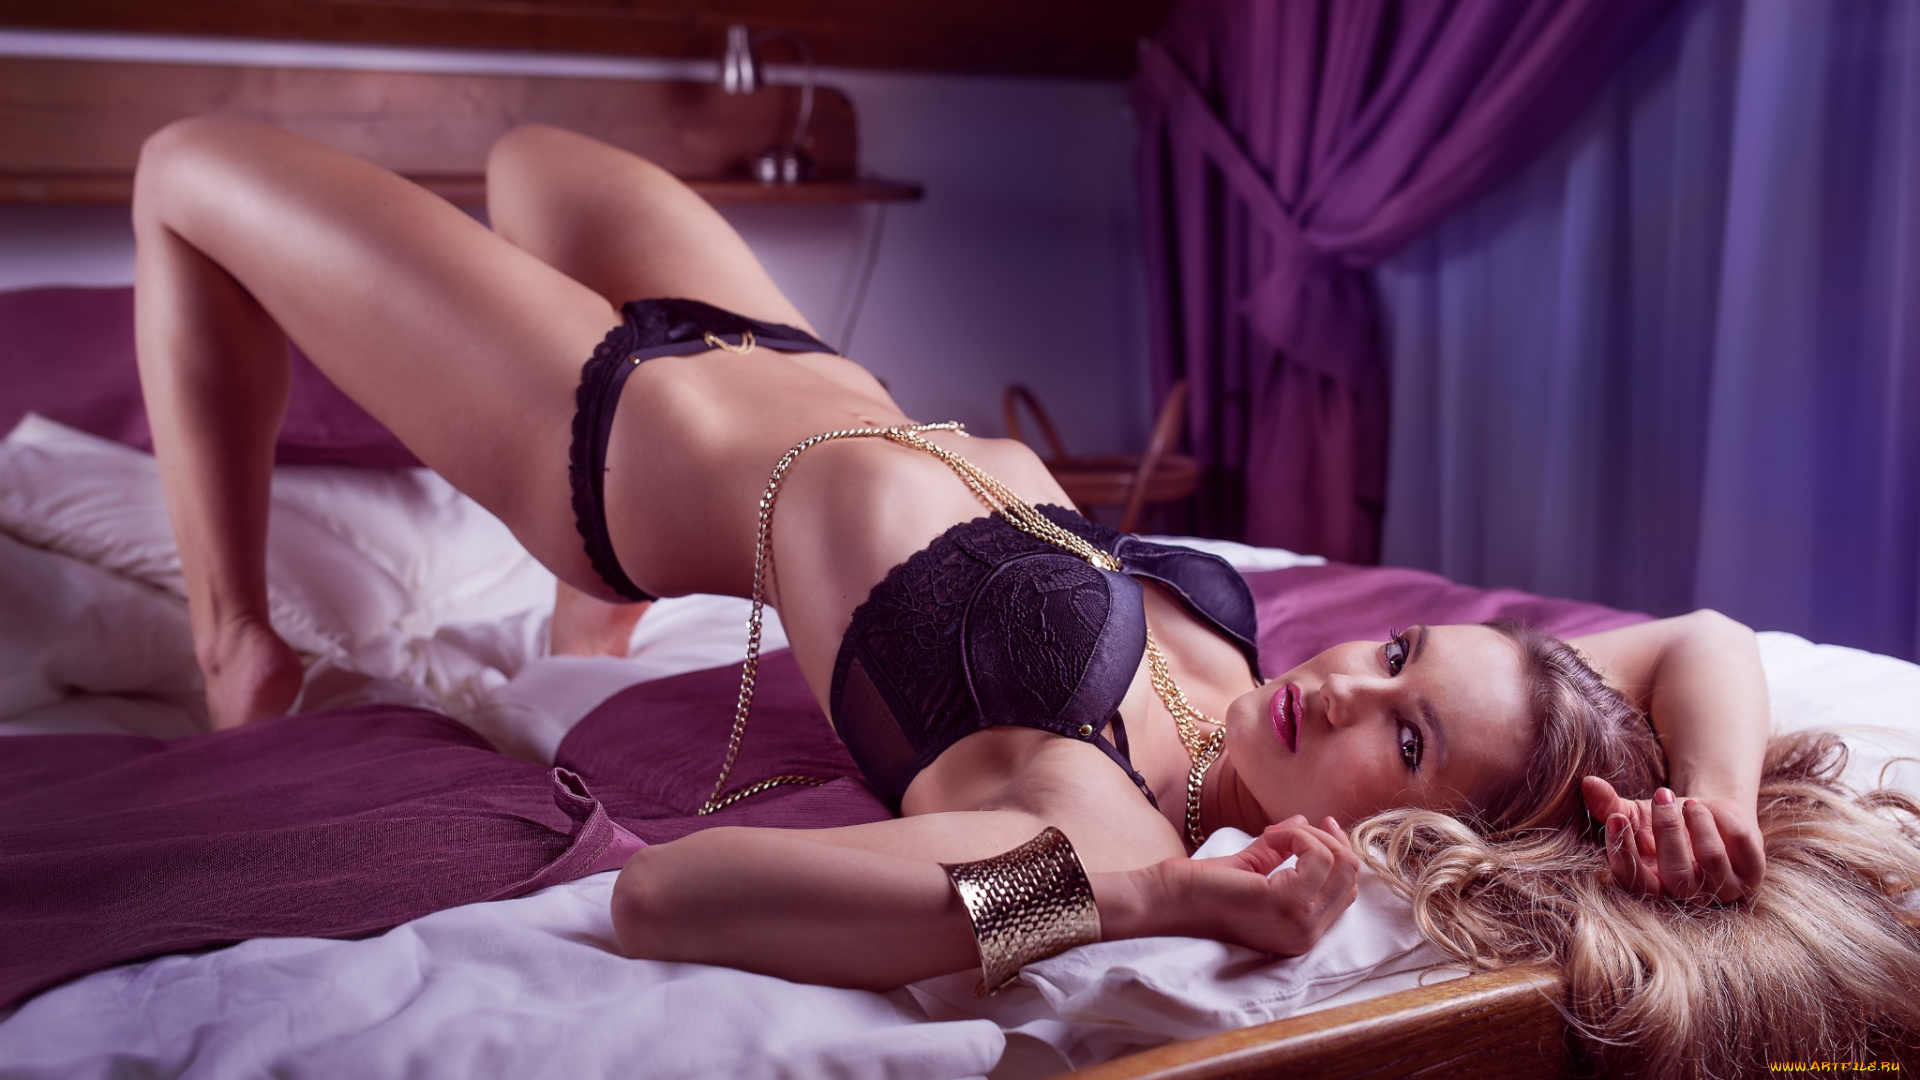 Девушки привязаны к кровати юбки